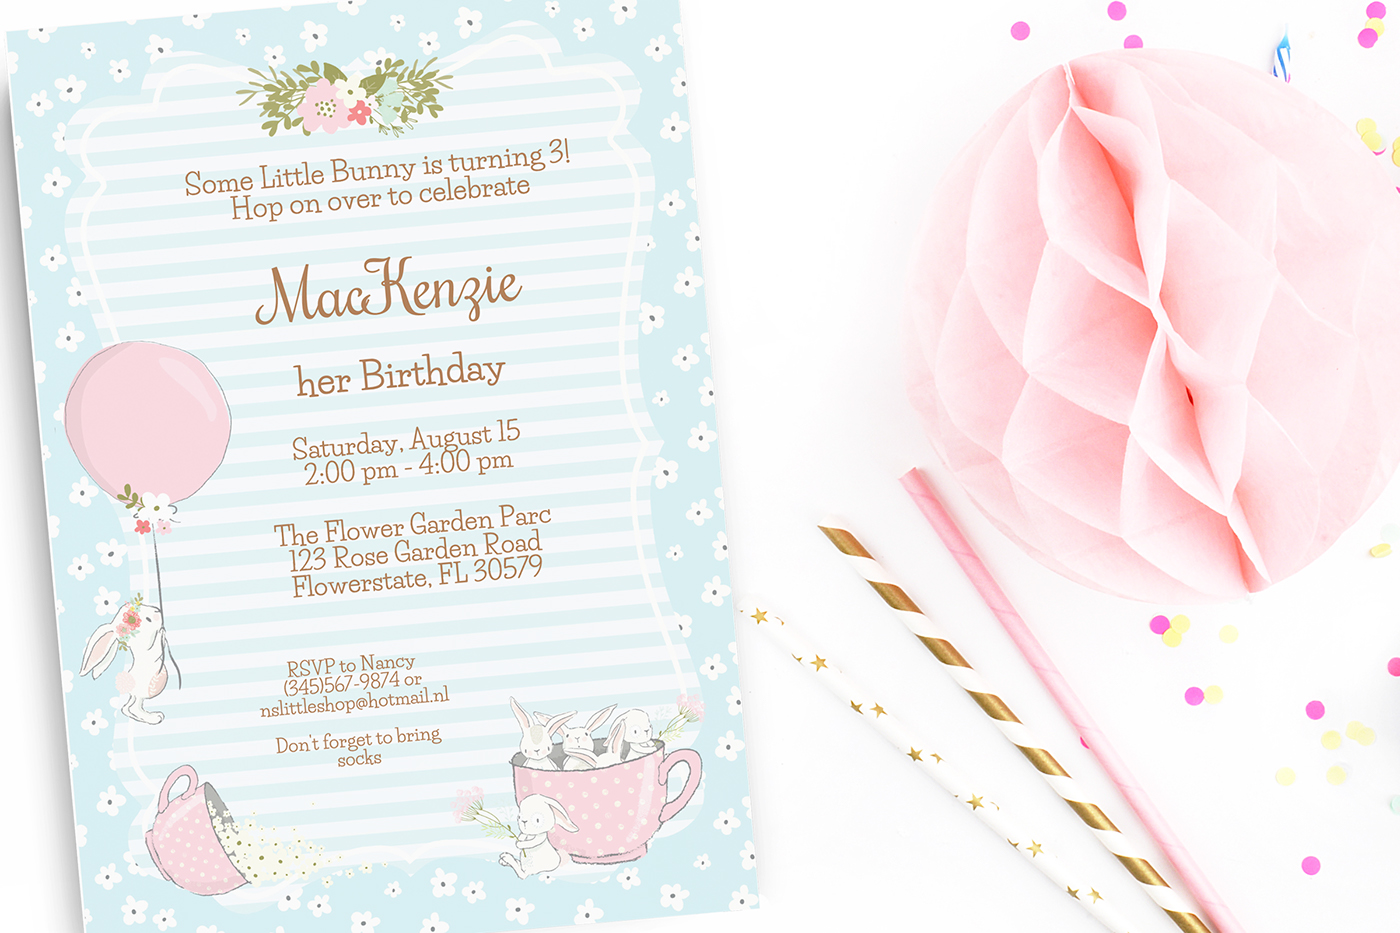 Bunny birthday party invitation, editable, printable on Behance